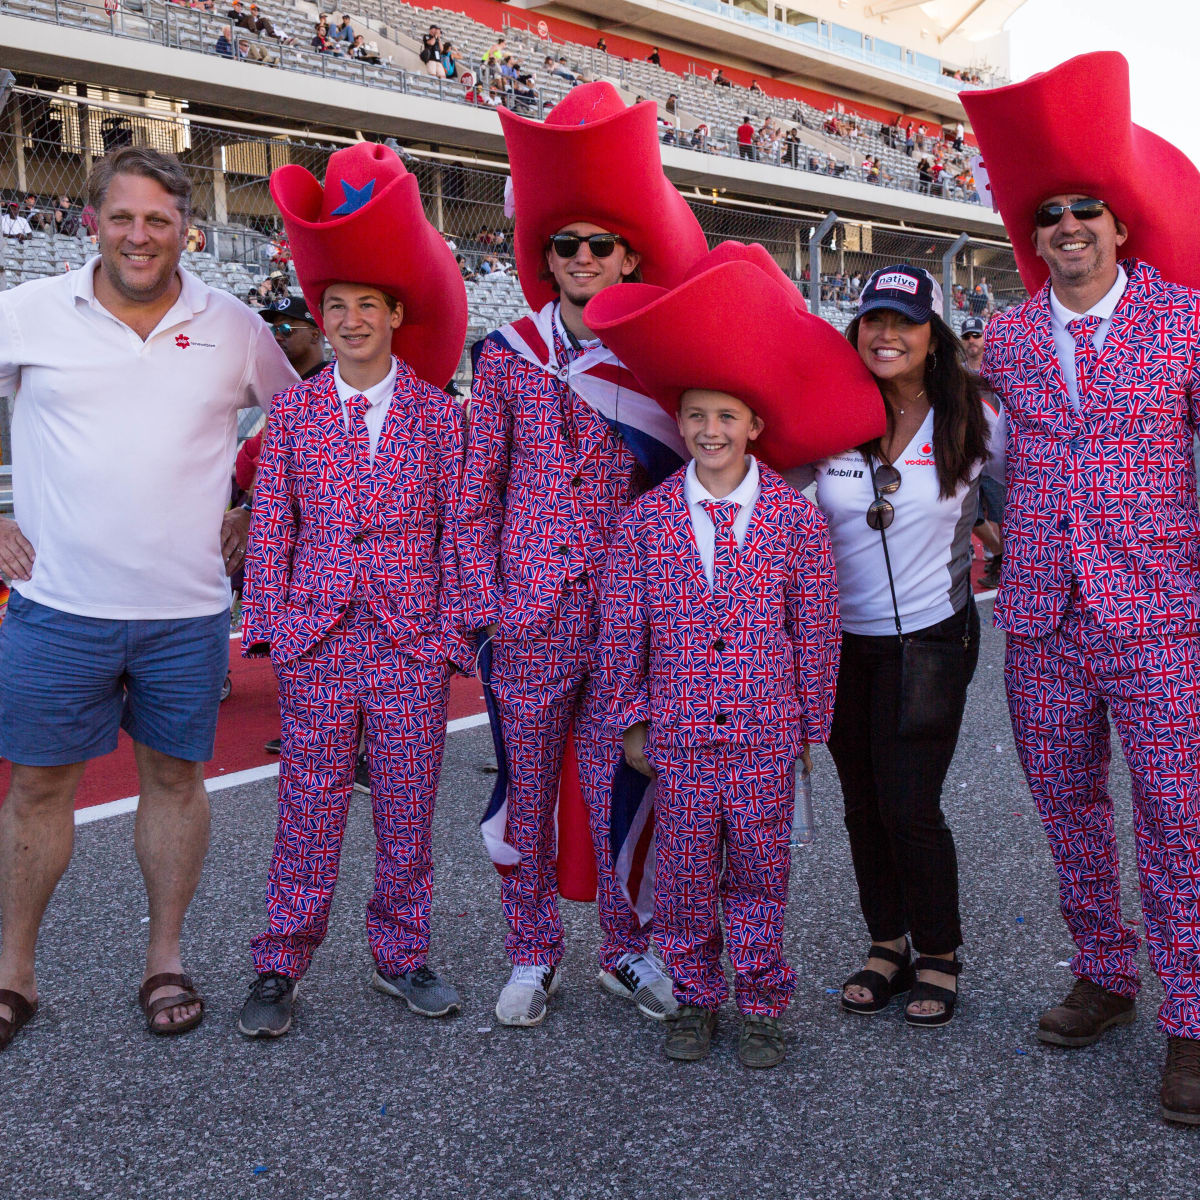 British family at COTA